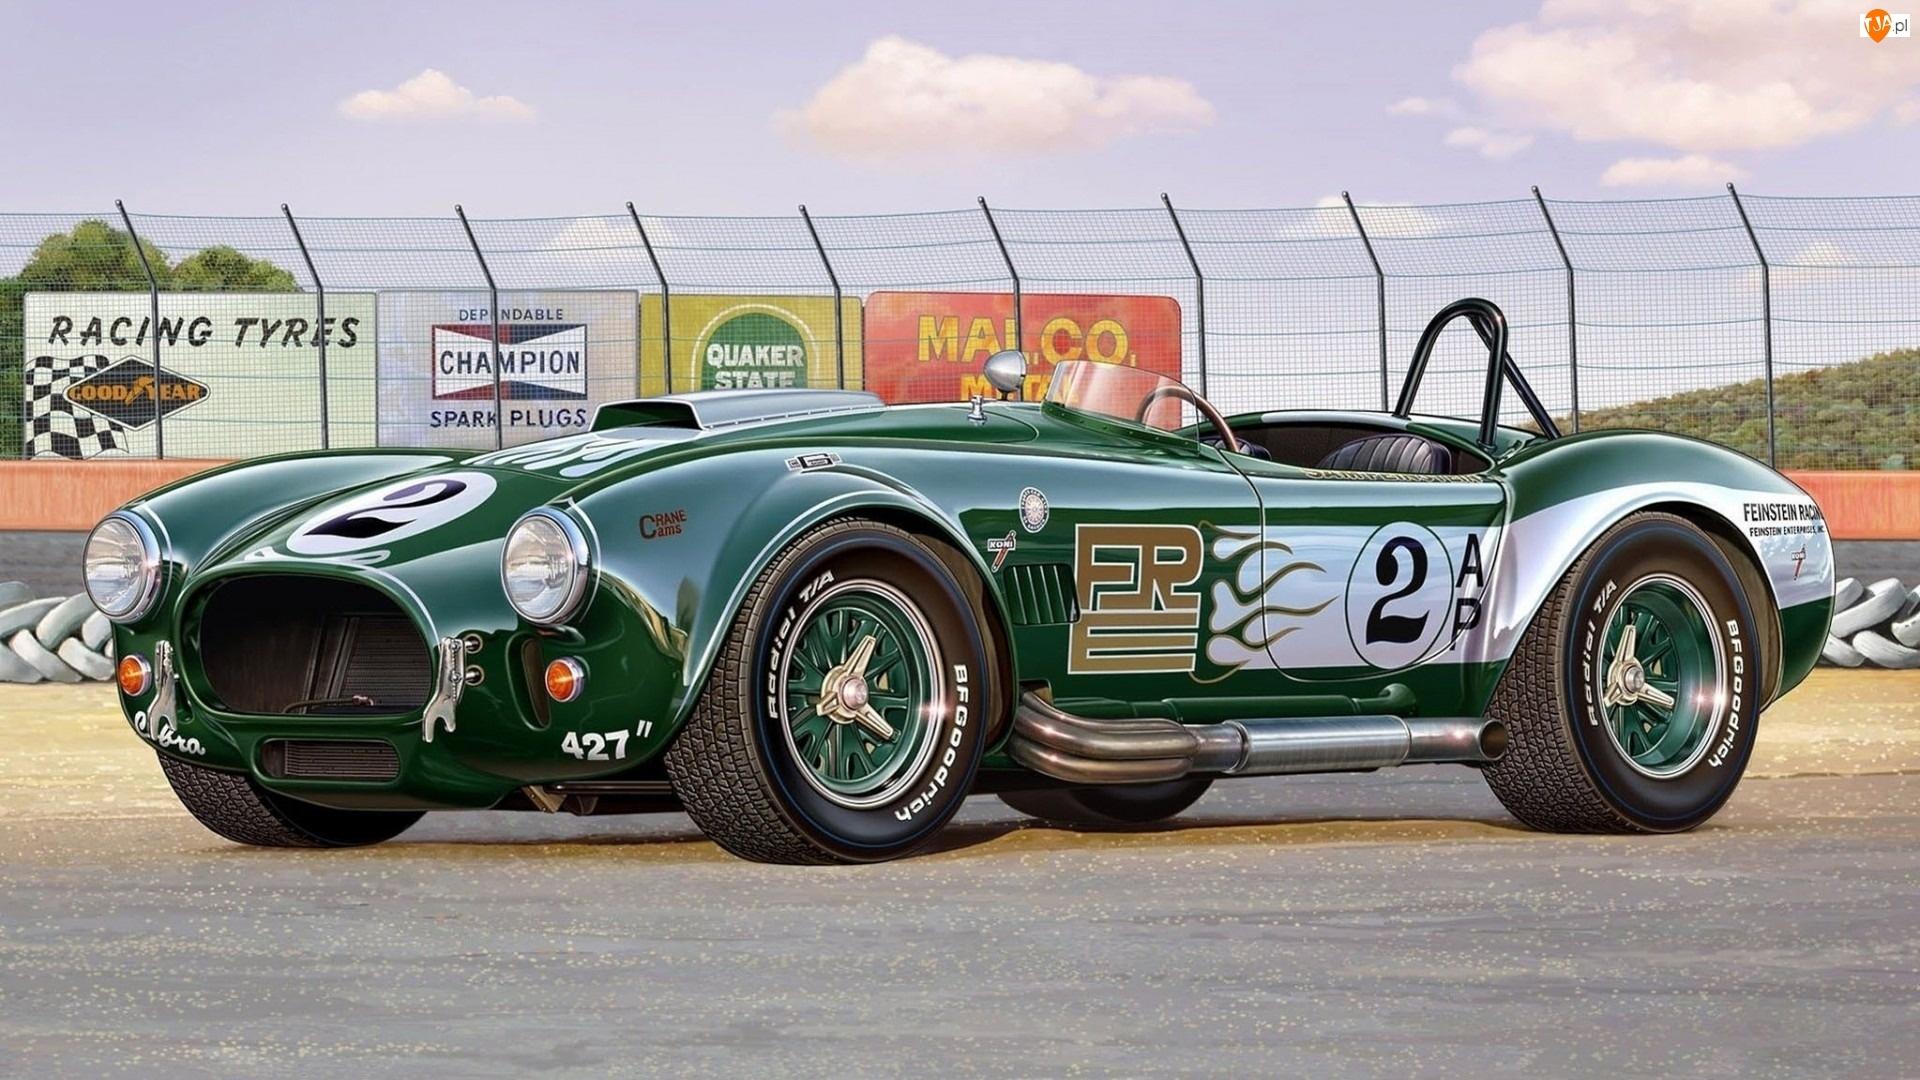 Shelby, Zielone, Cobra, Auto, 427